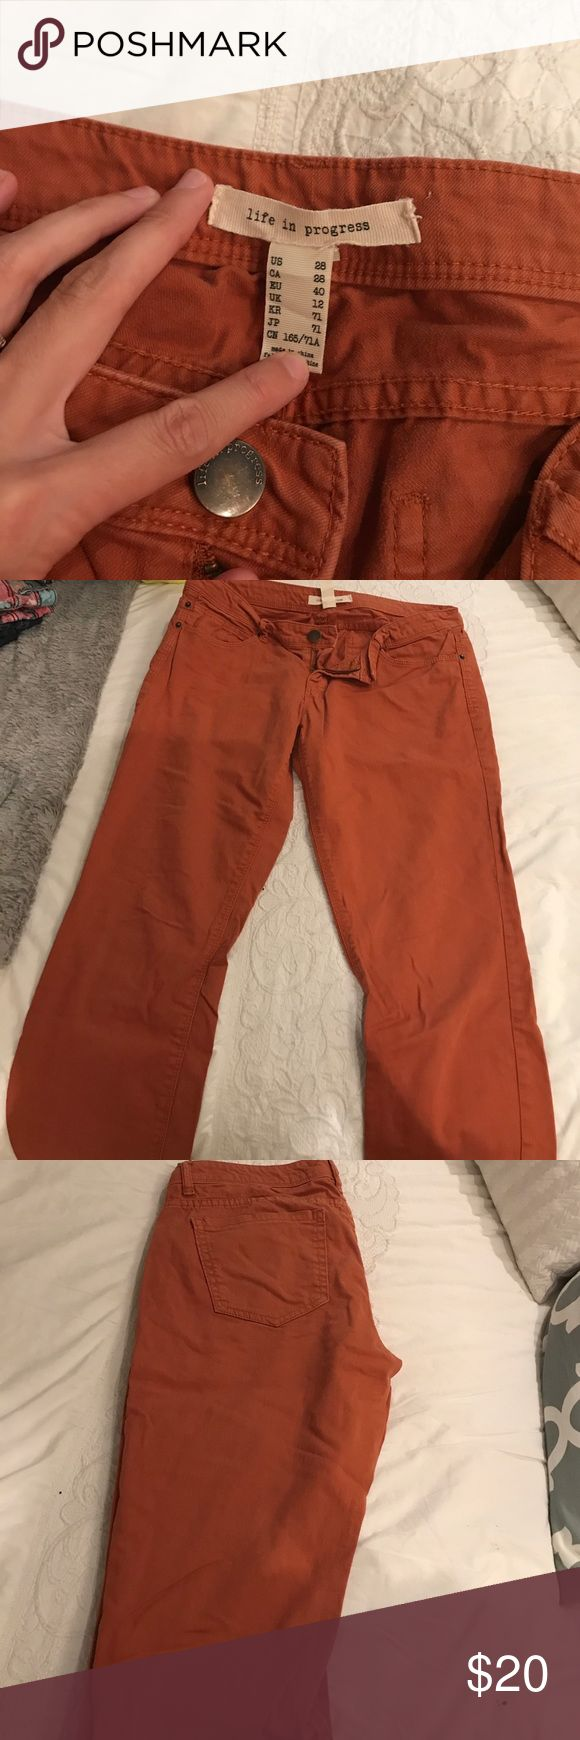 Burnt orange pants Burnt orange pants. Bought for UT game, only worn twice. life in progress Pants Skinny